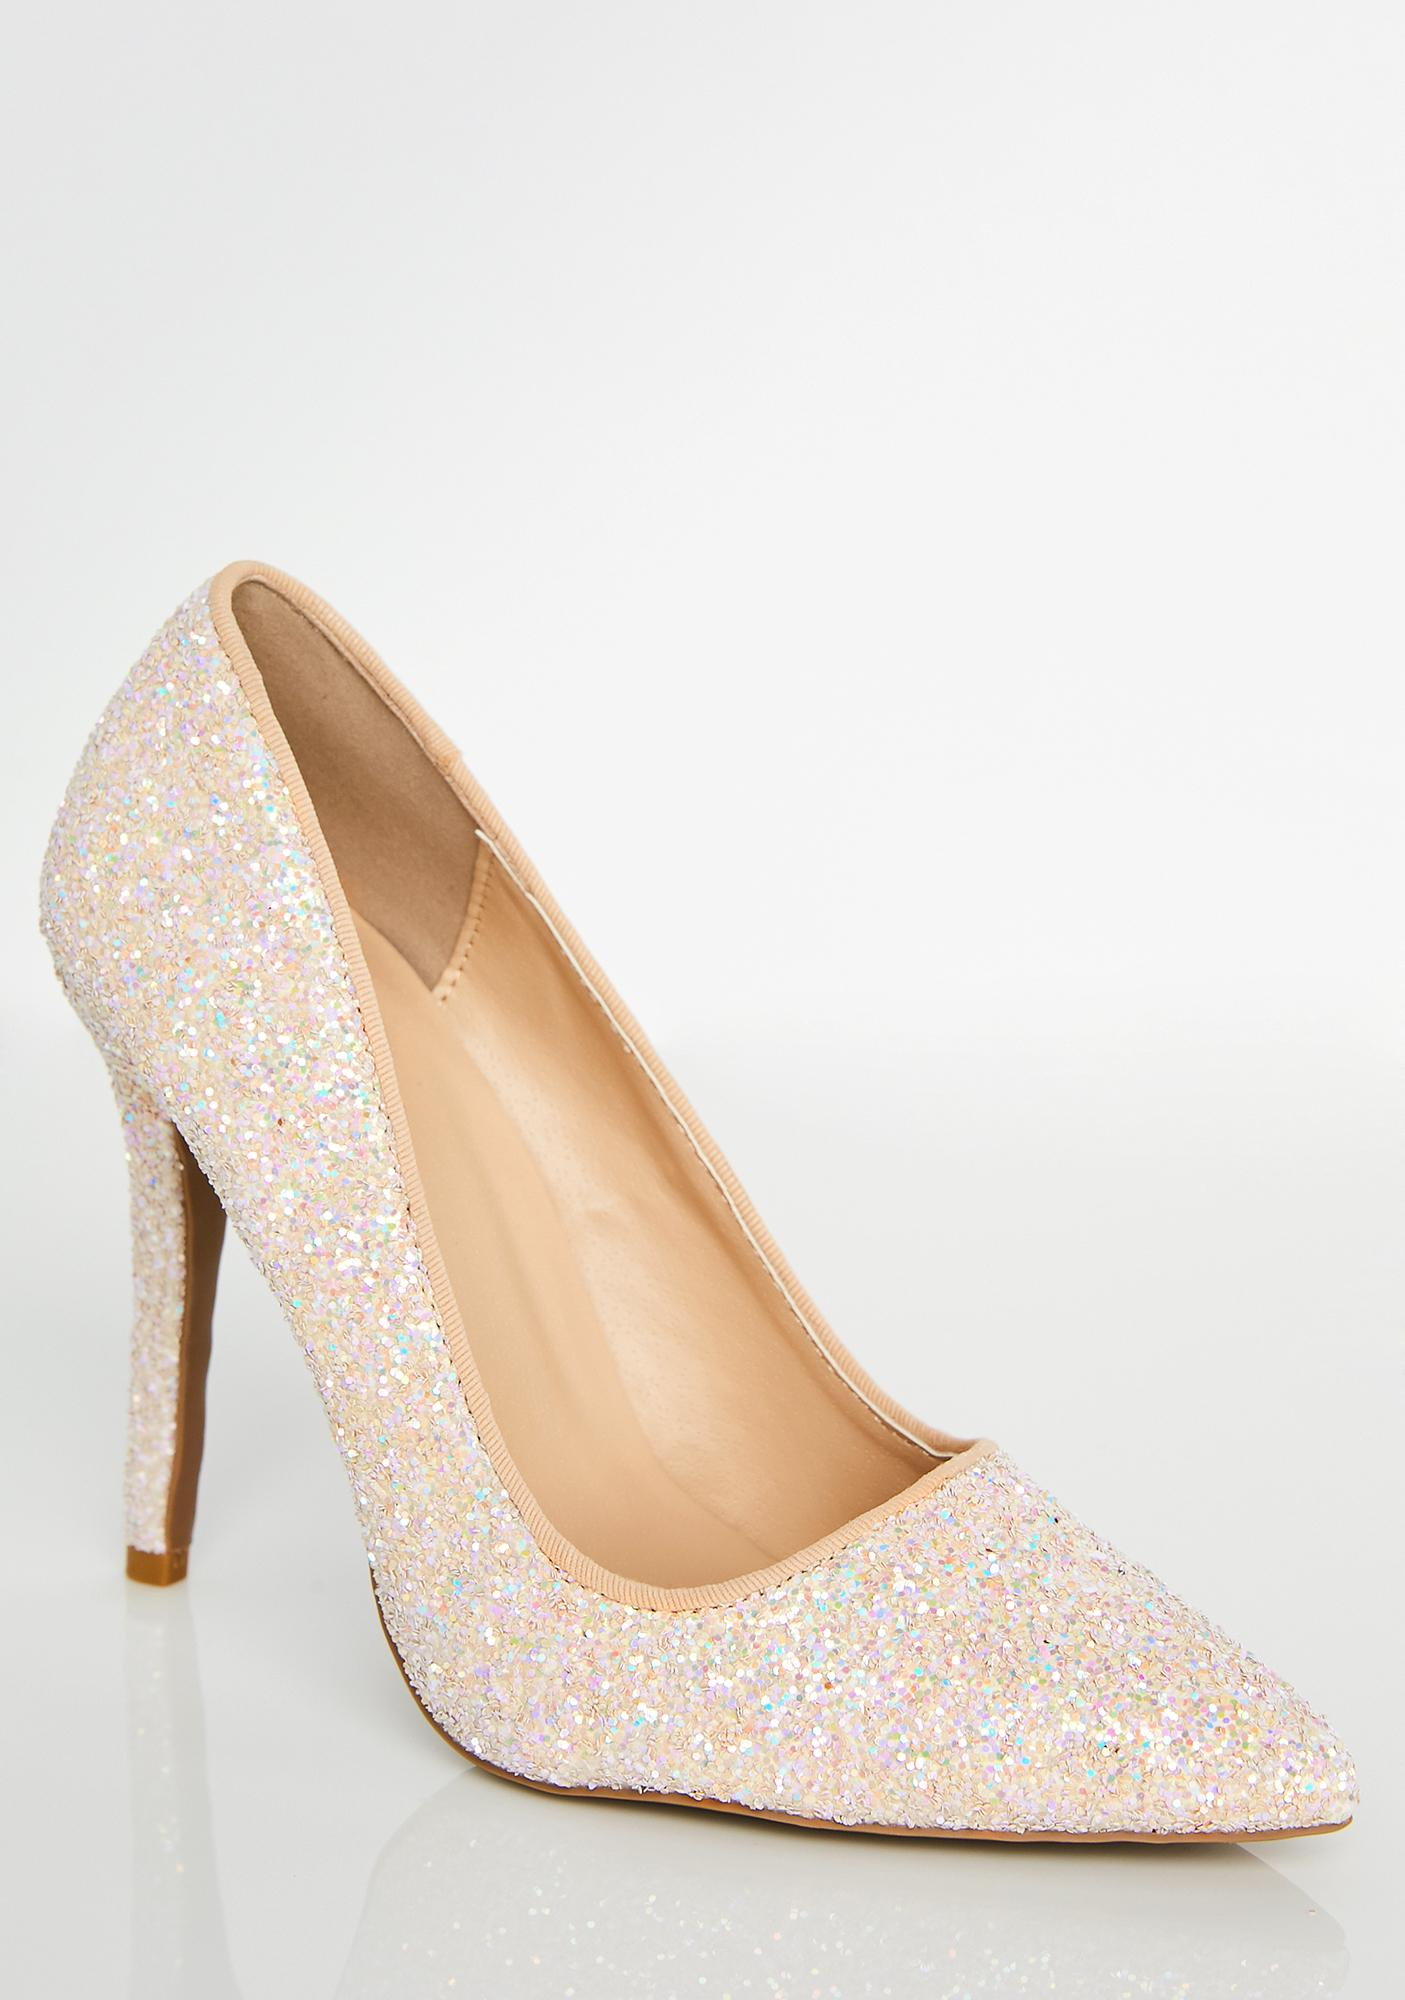 Lady Glitter Sparkles Pumps